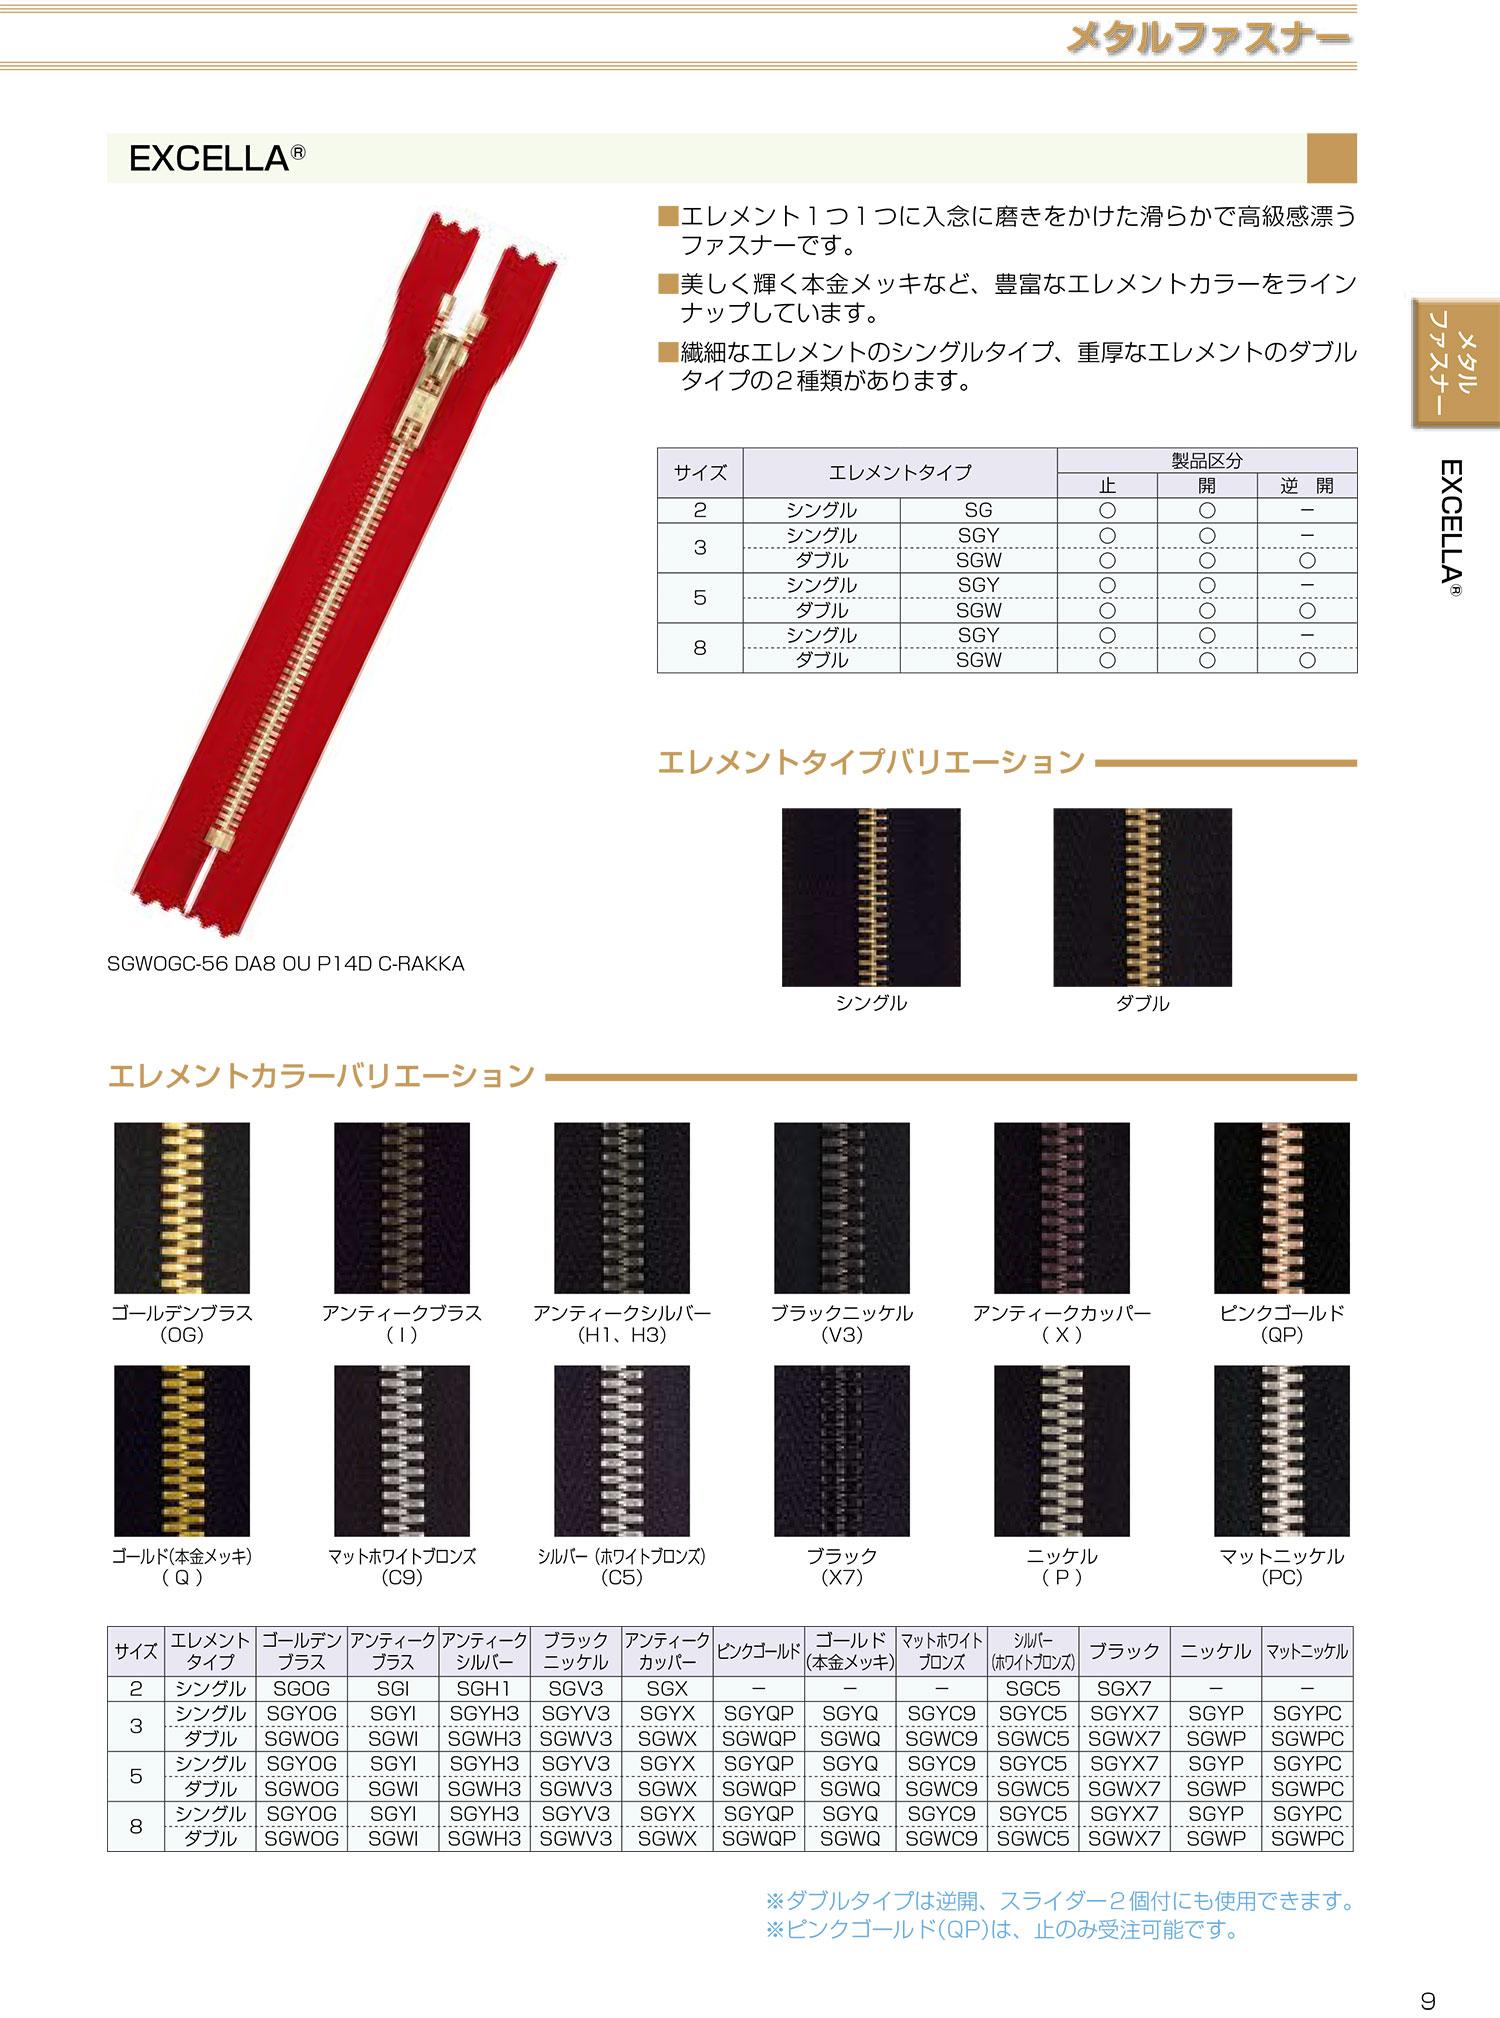 2SGX7OR エクセラ 2サイズ ブラック オープン シングル[ファスナー] YKK/オークラ商事 - ApparelX アパレル資材卸通販